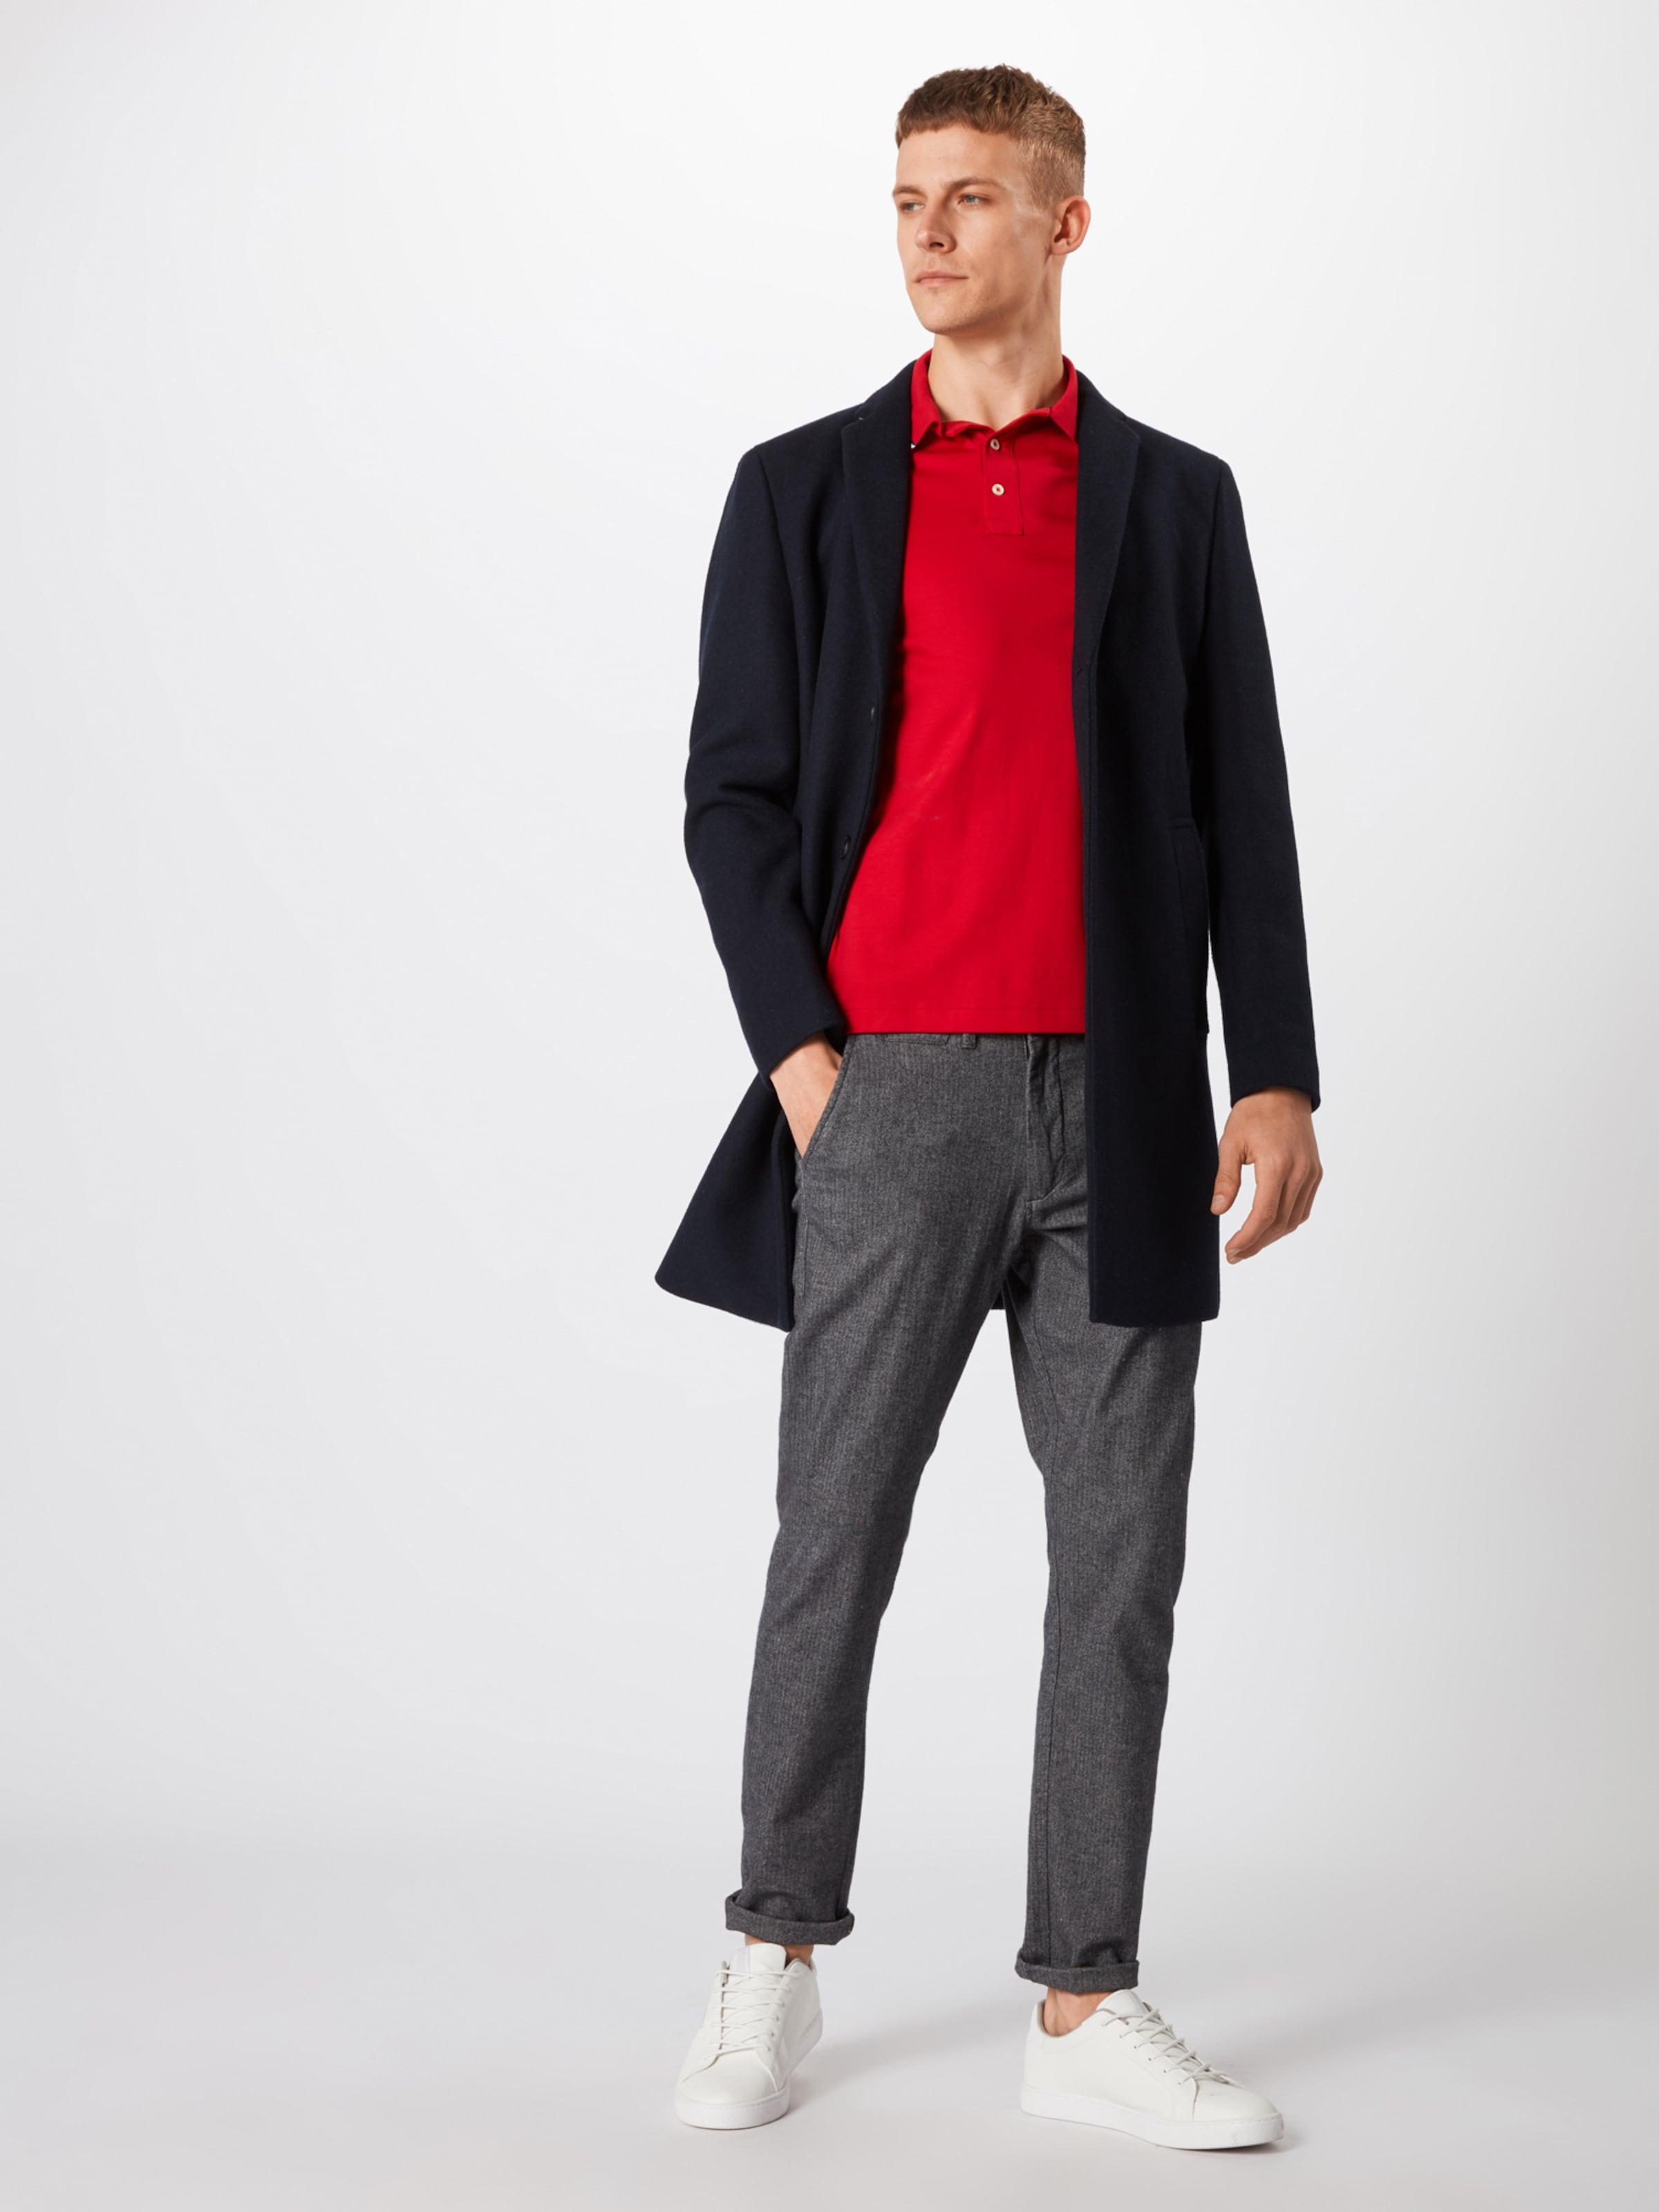 Ralph Lauren 'sskccmslm1 knit' In Sleeve Rot short Polo sQtxChrd